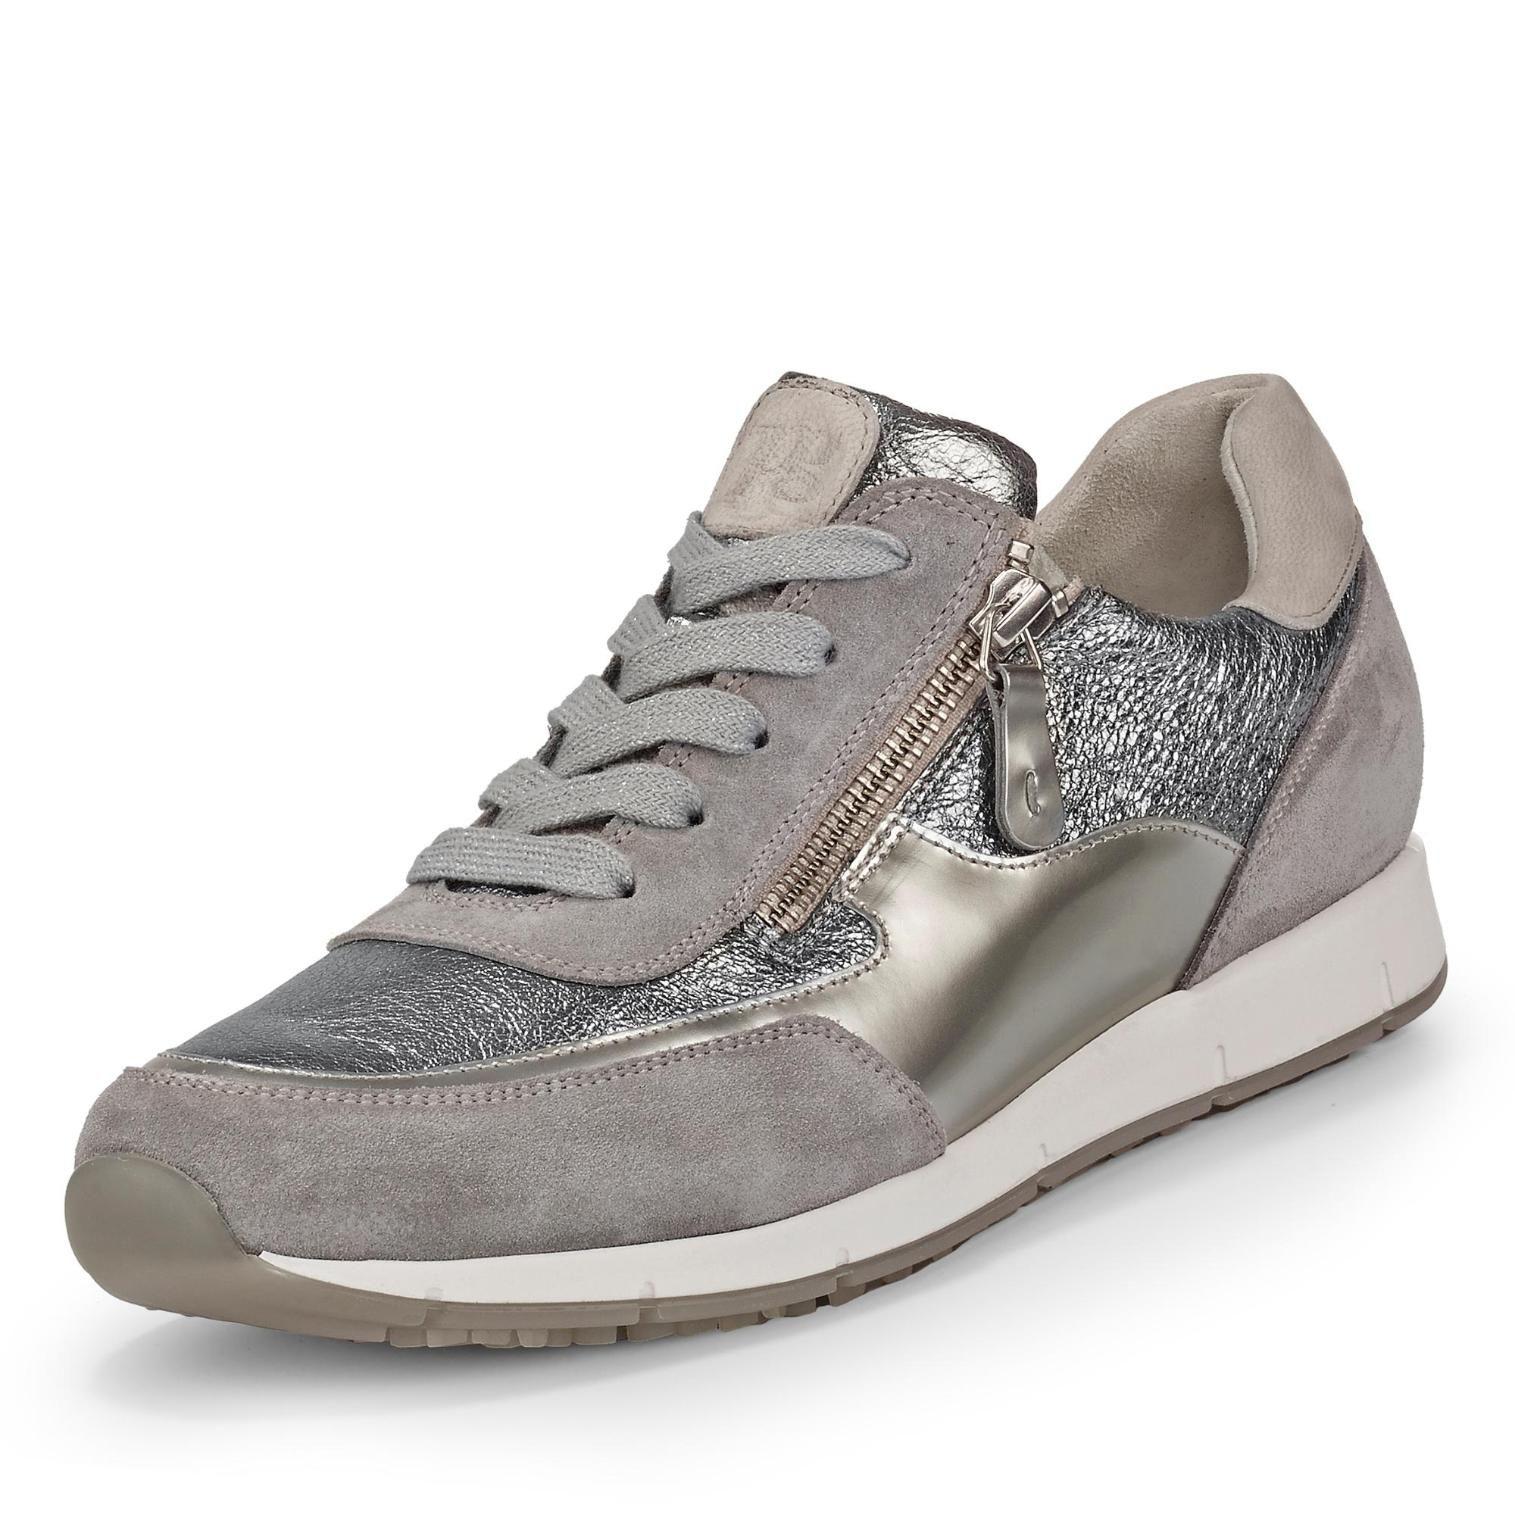 Gabor Comfort Sneaker in Farbe dunkelgrau um 20% reduziert